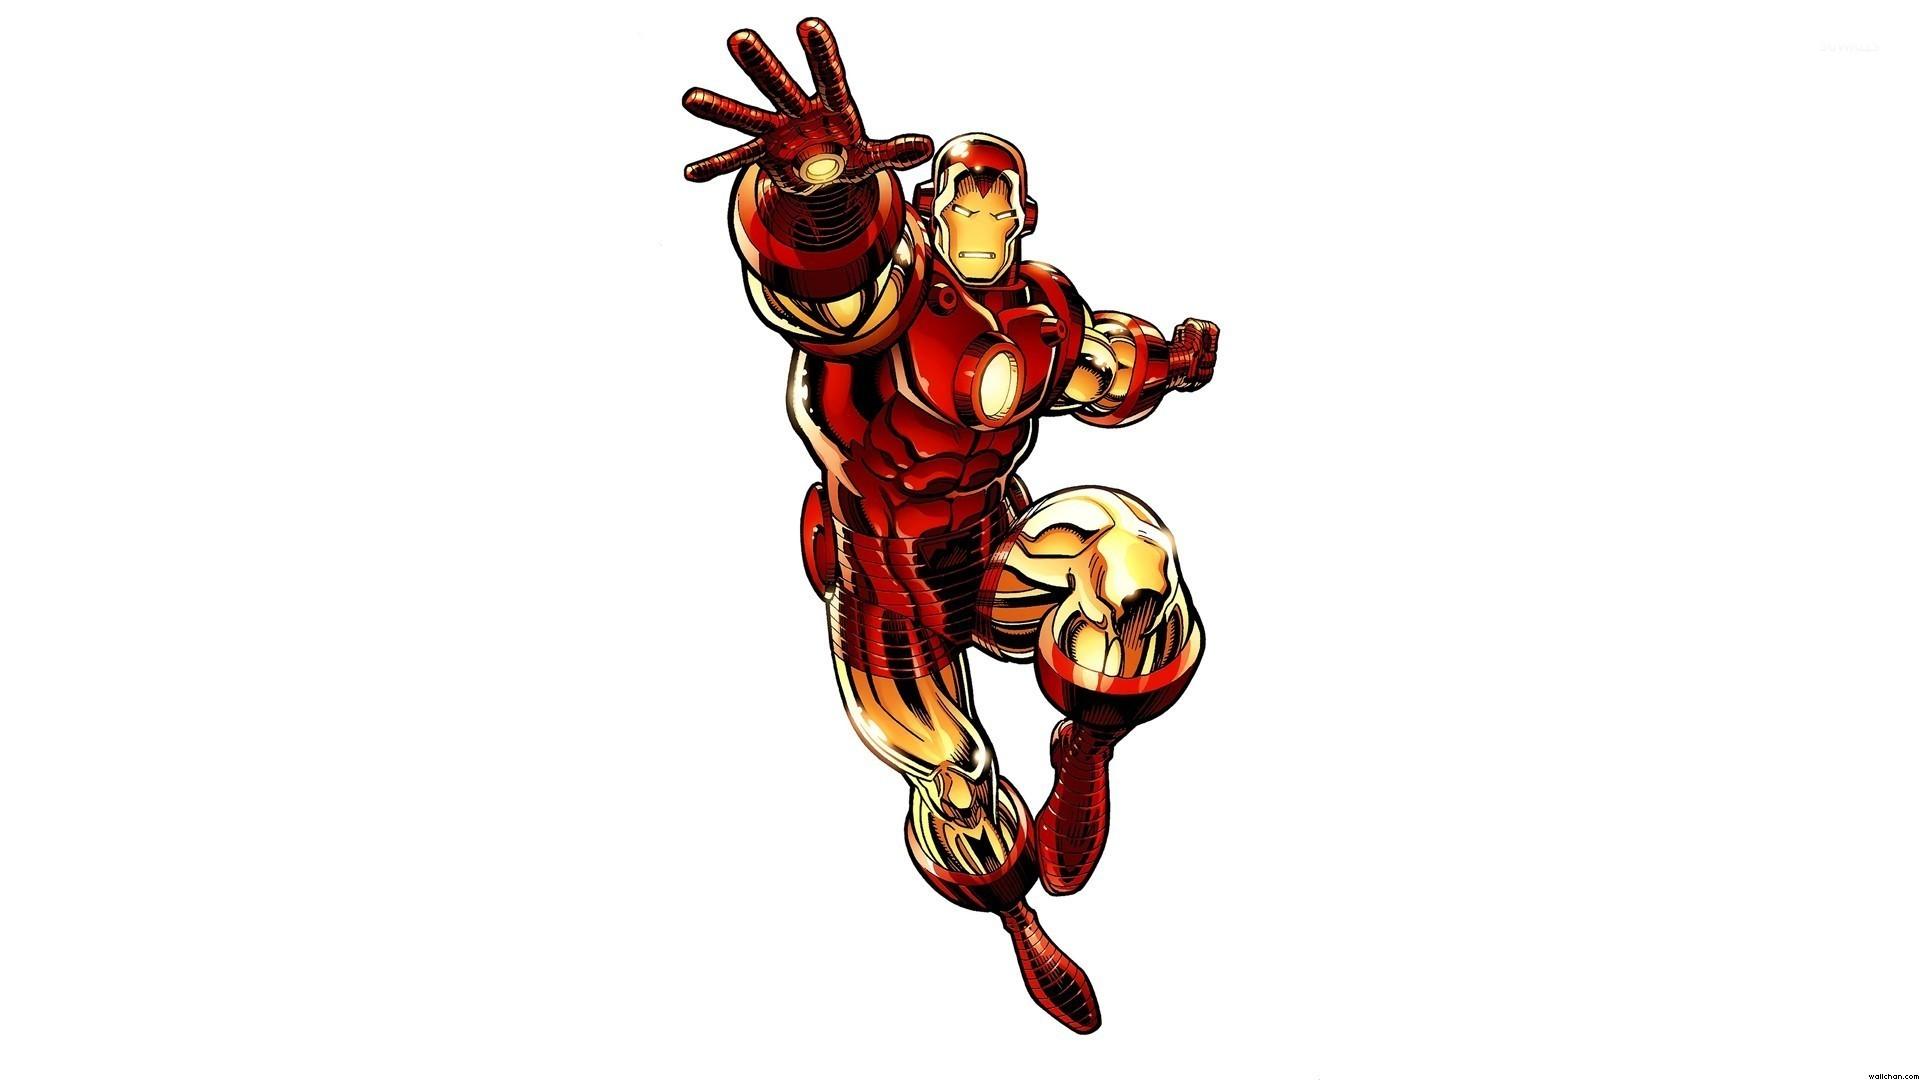 Iron Man fighting wallpaper jpg